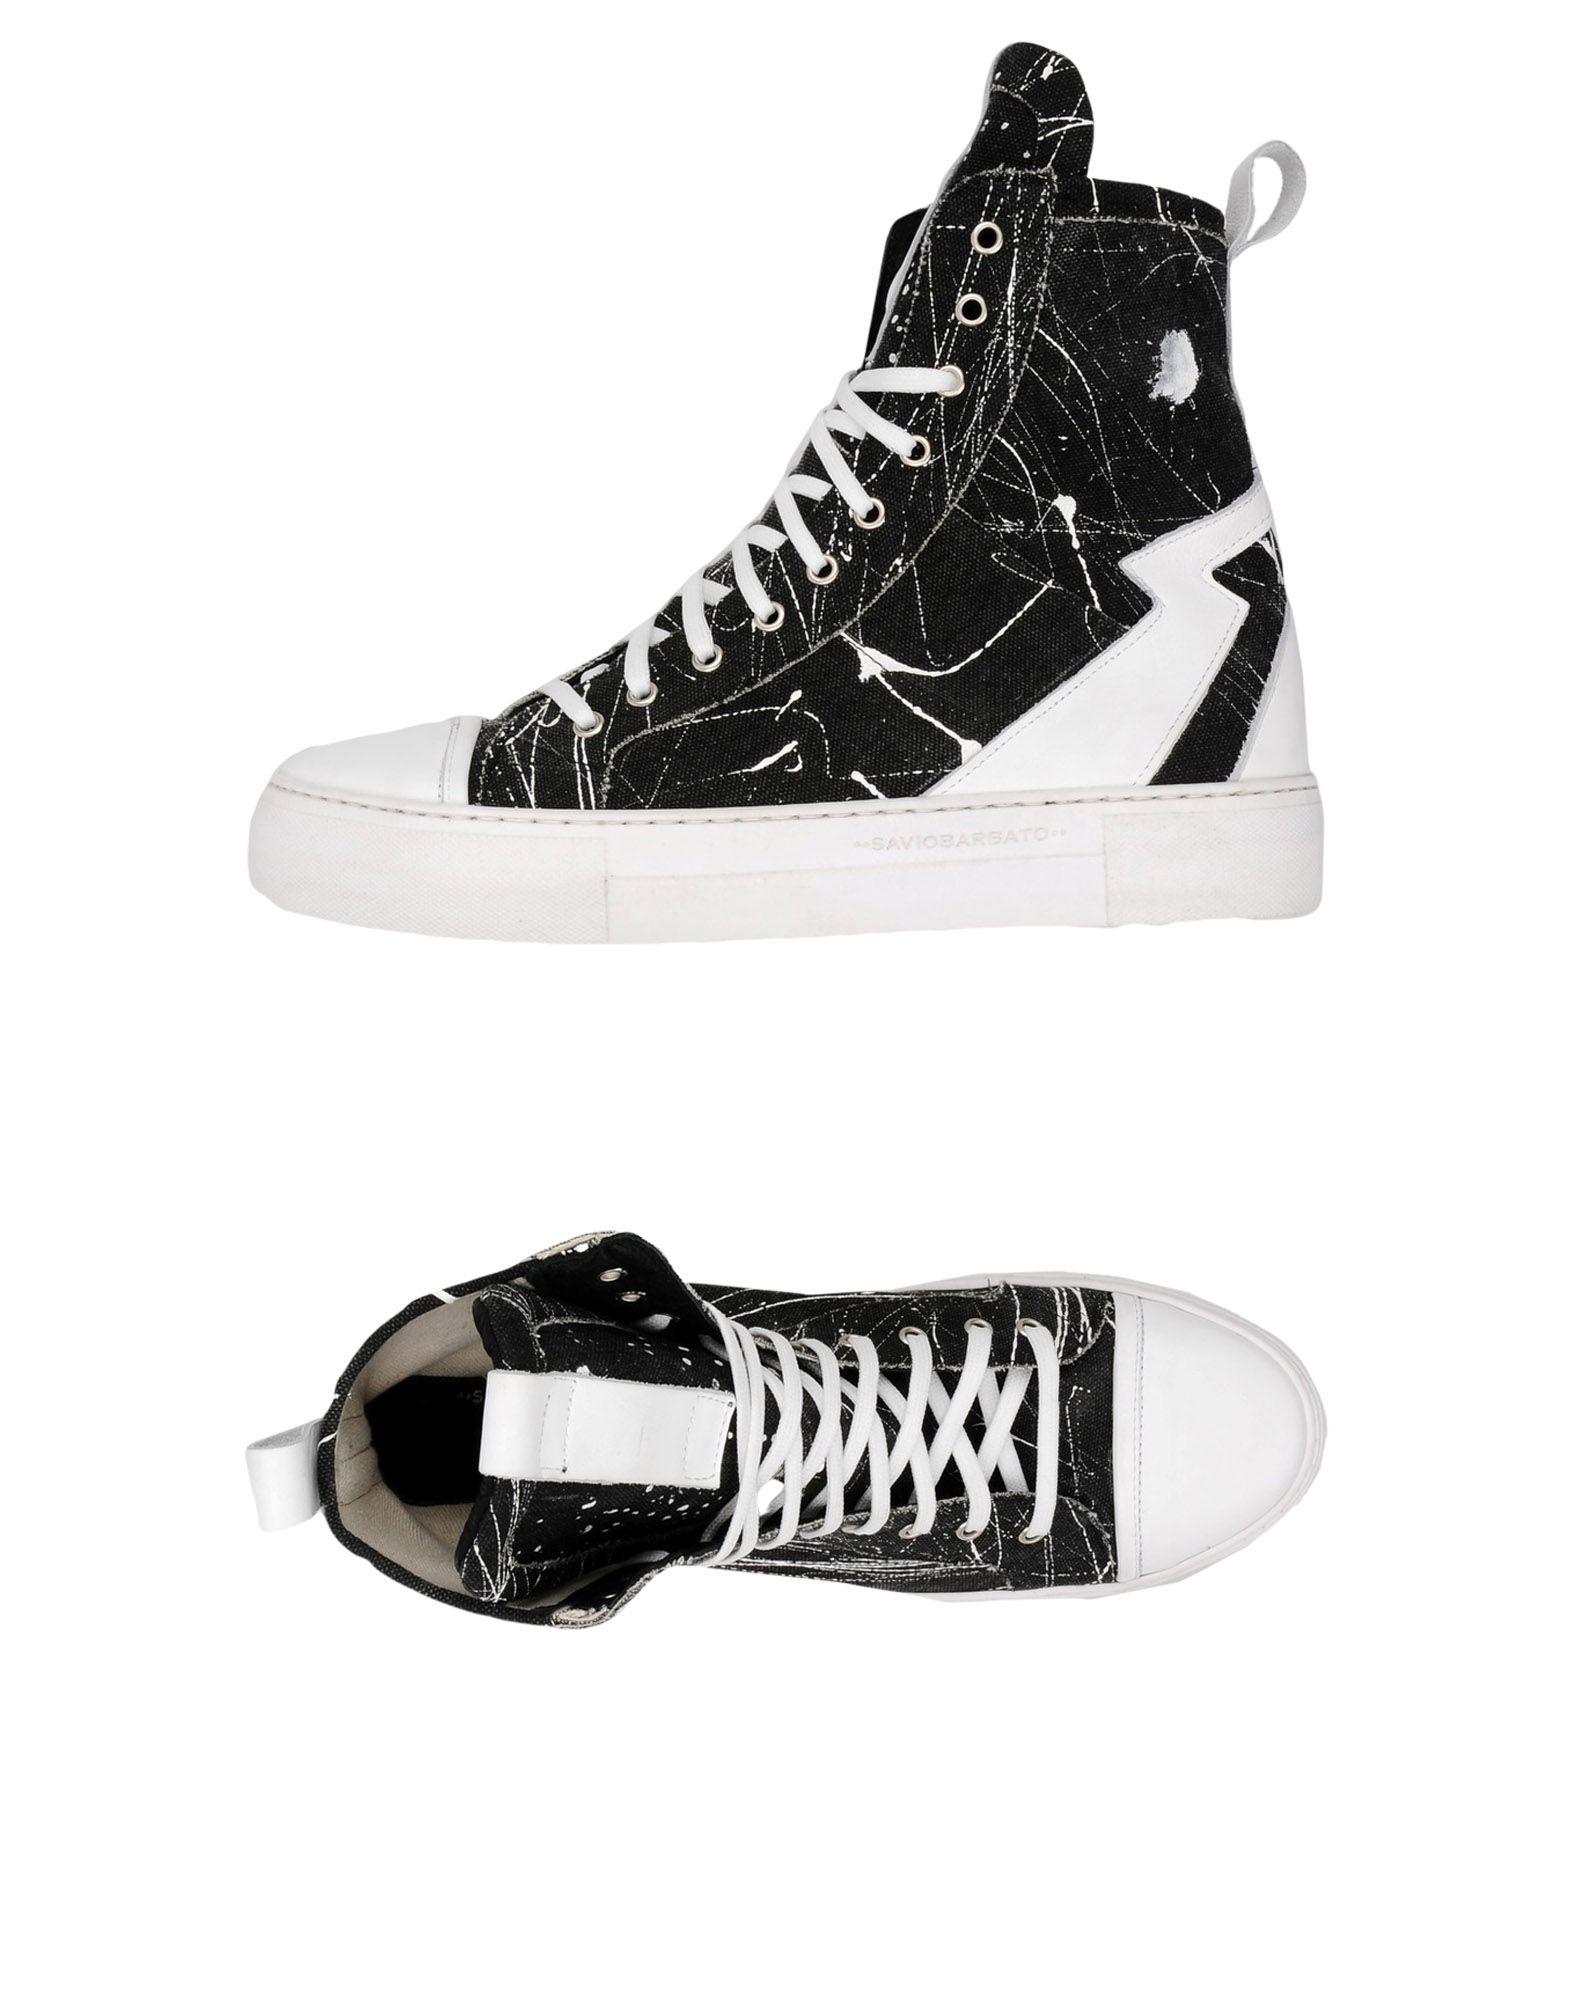 Savio Barbato Sneakers Herren  11447842LG Gute Qualität beliebte Schuhe